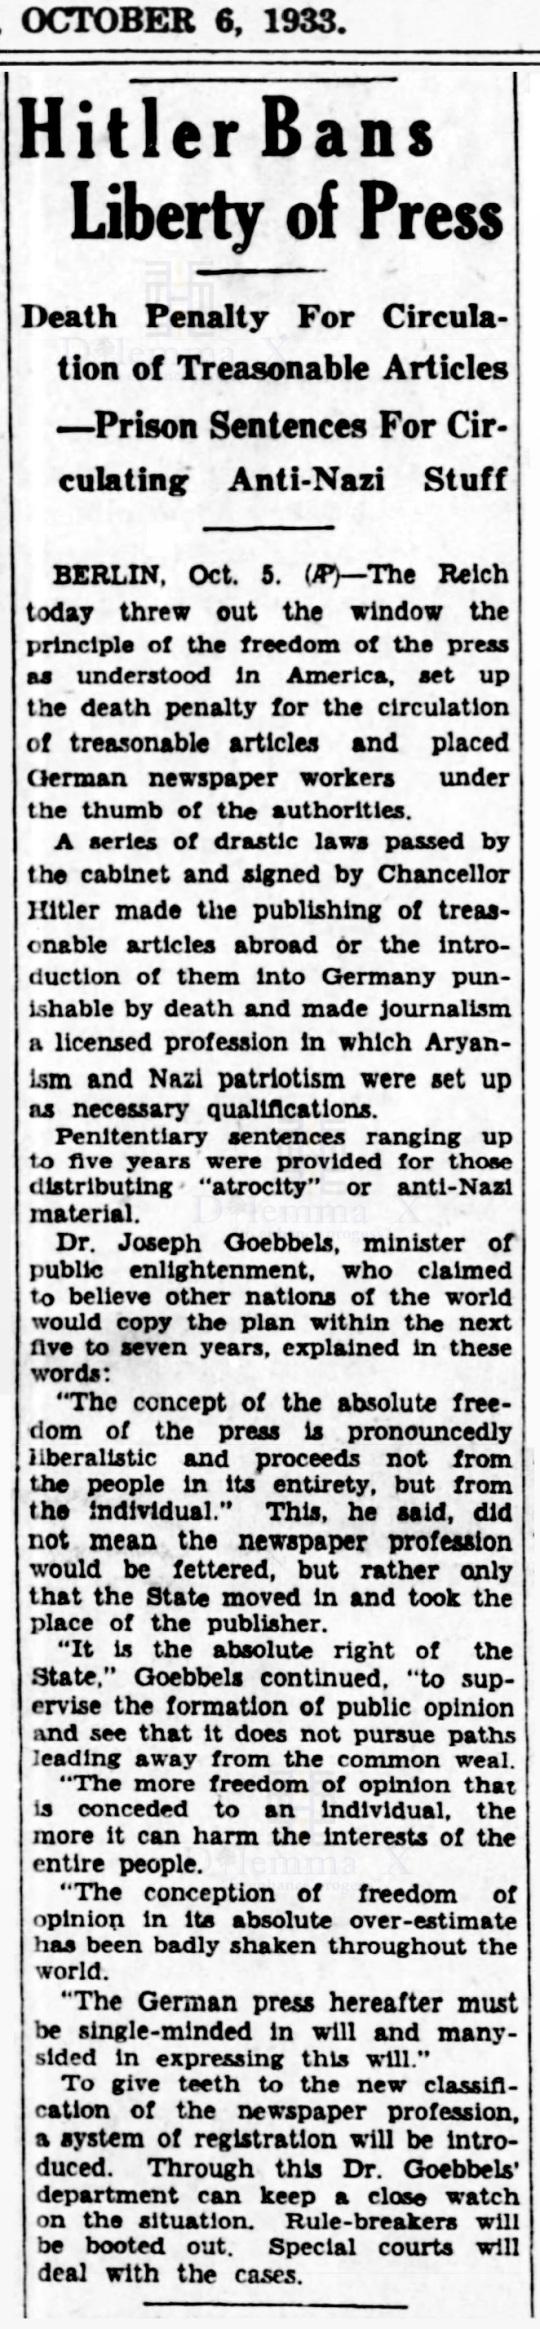 1933-october-hitler-press